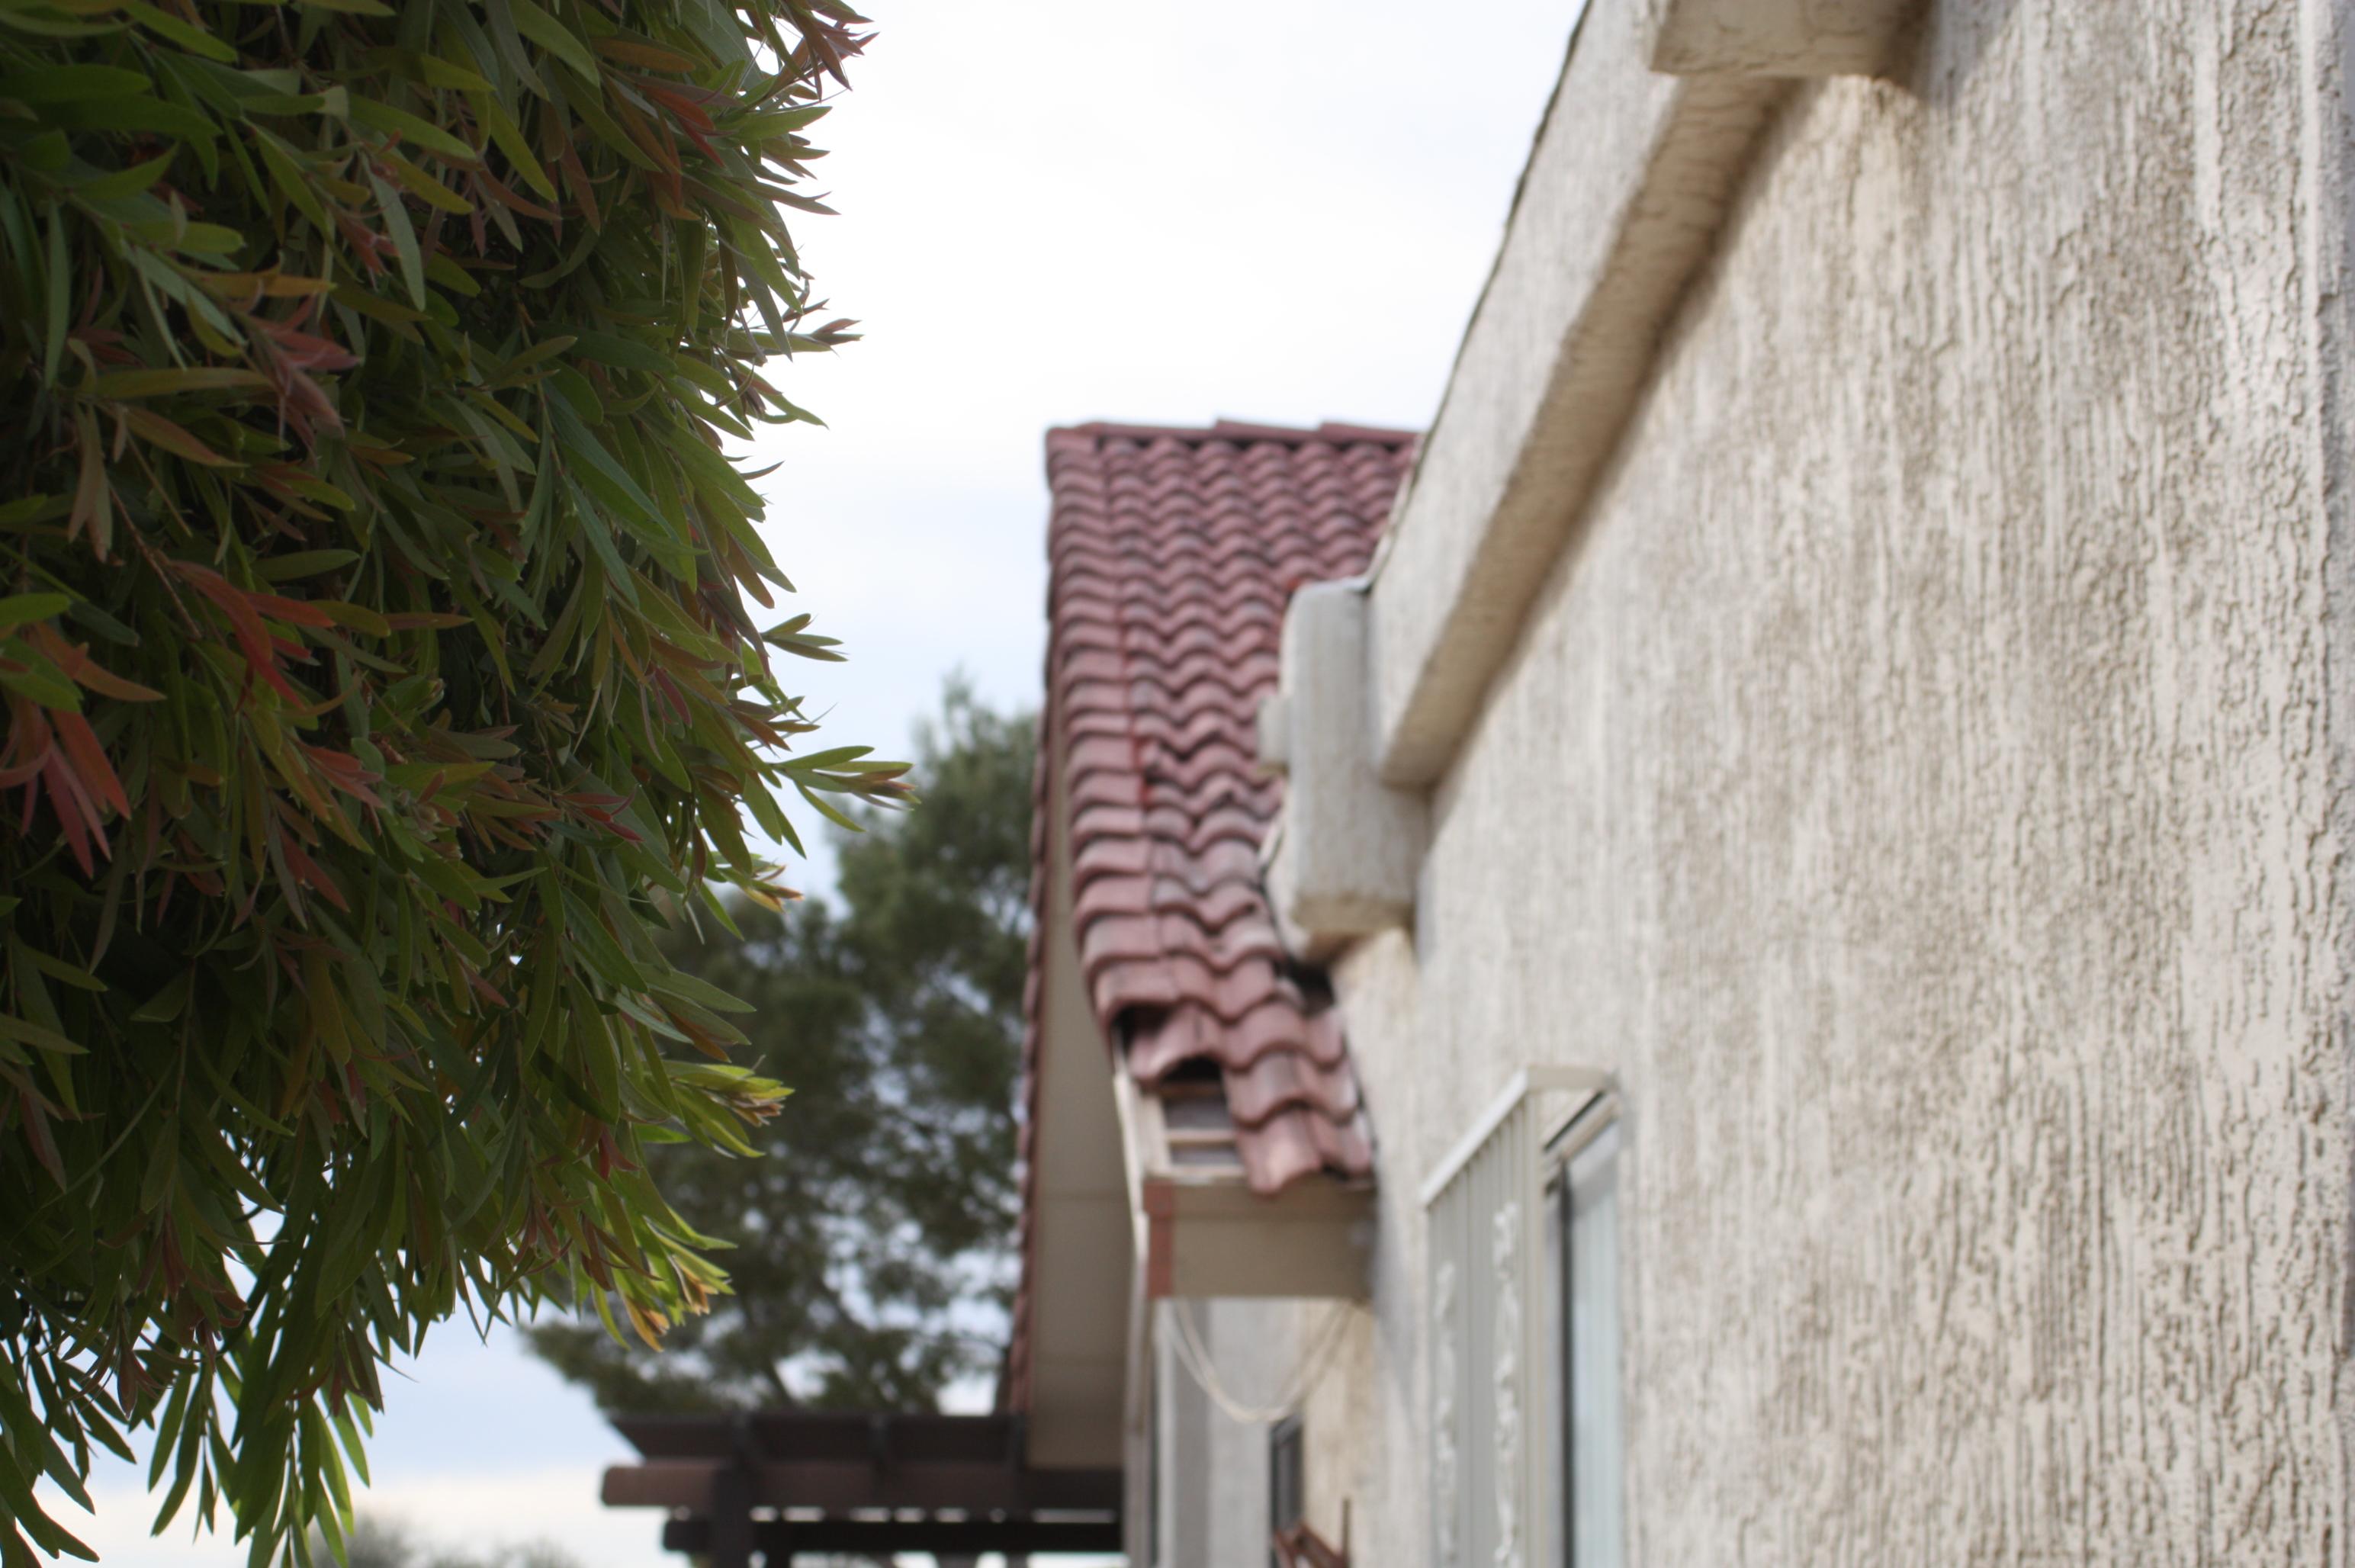 Roofline Refurbished - Photo 2